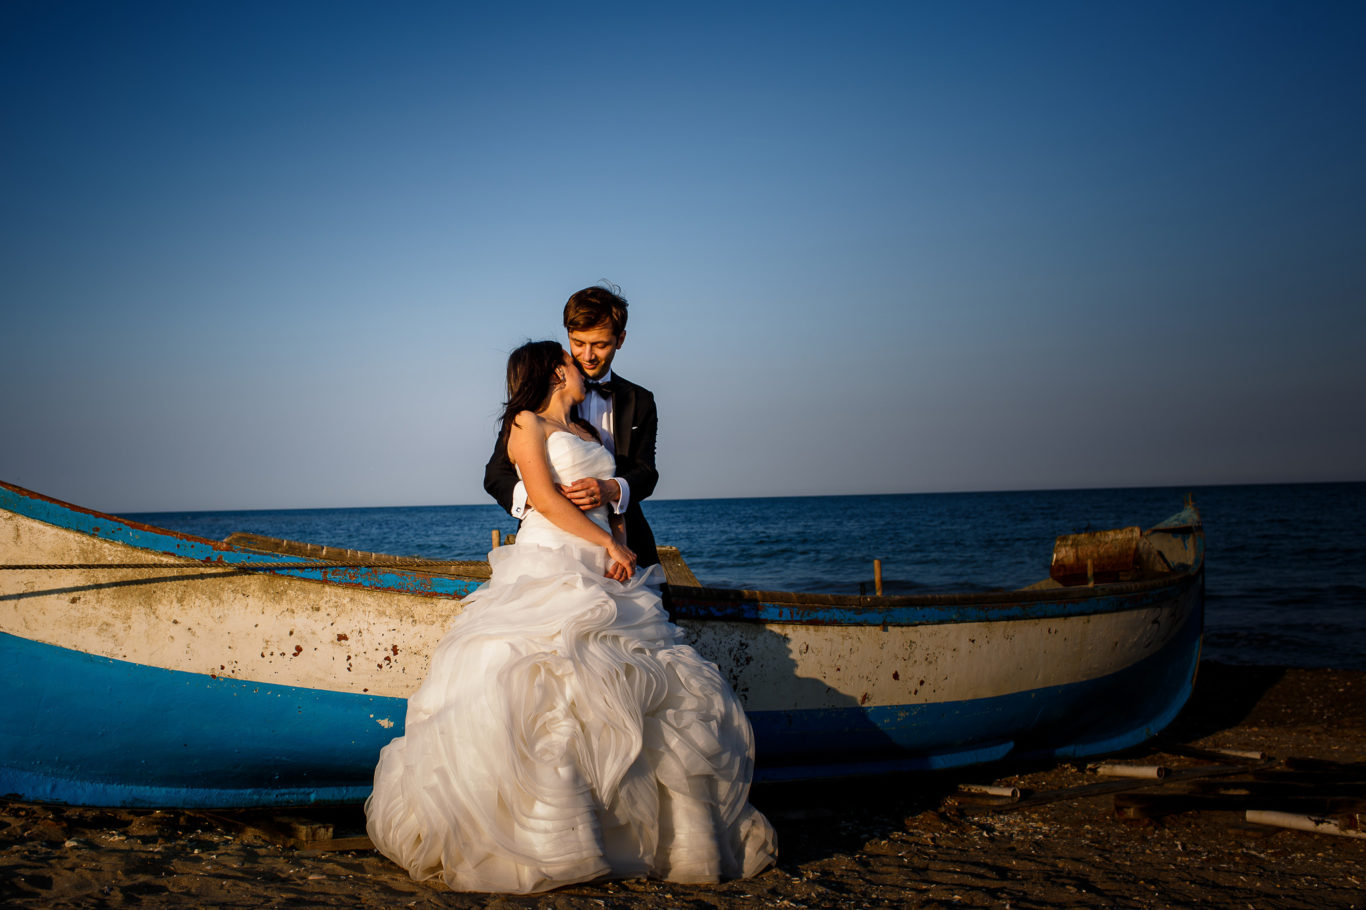 1207-Sesiune-foto-TTD-Simona-Valentin-fotograf-Ciprian-Dumitrescu-CDF_0254